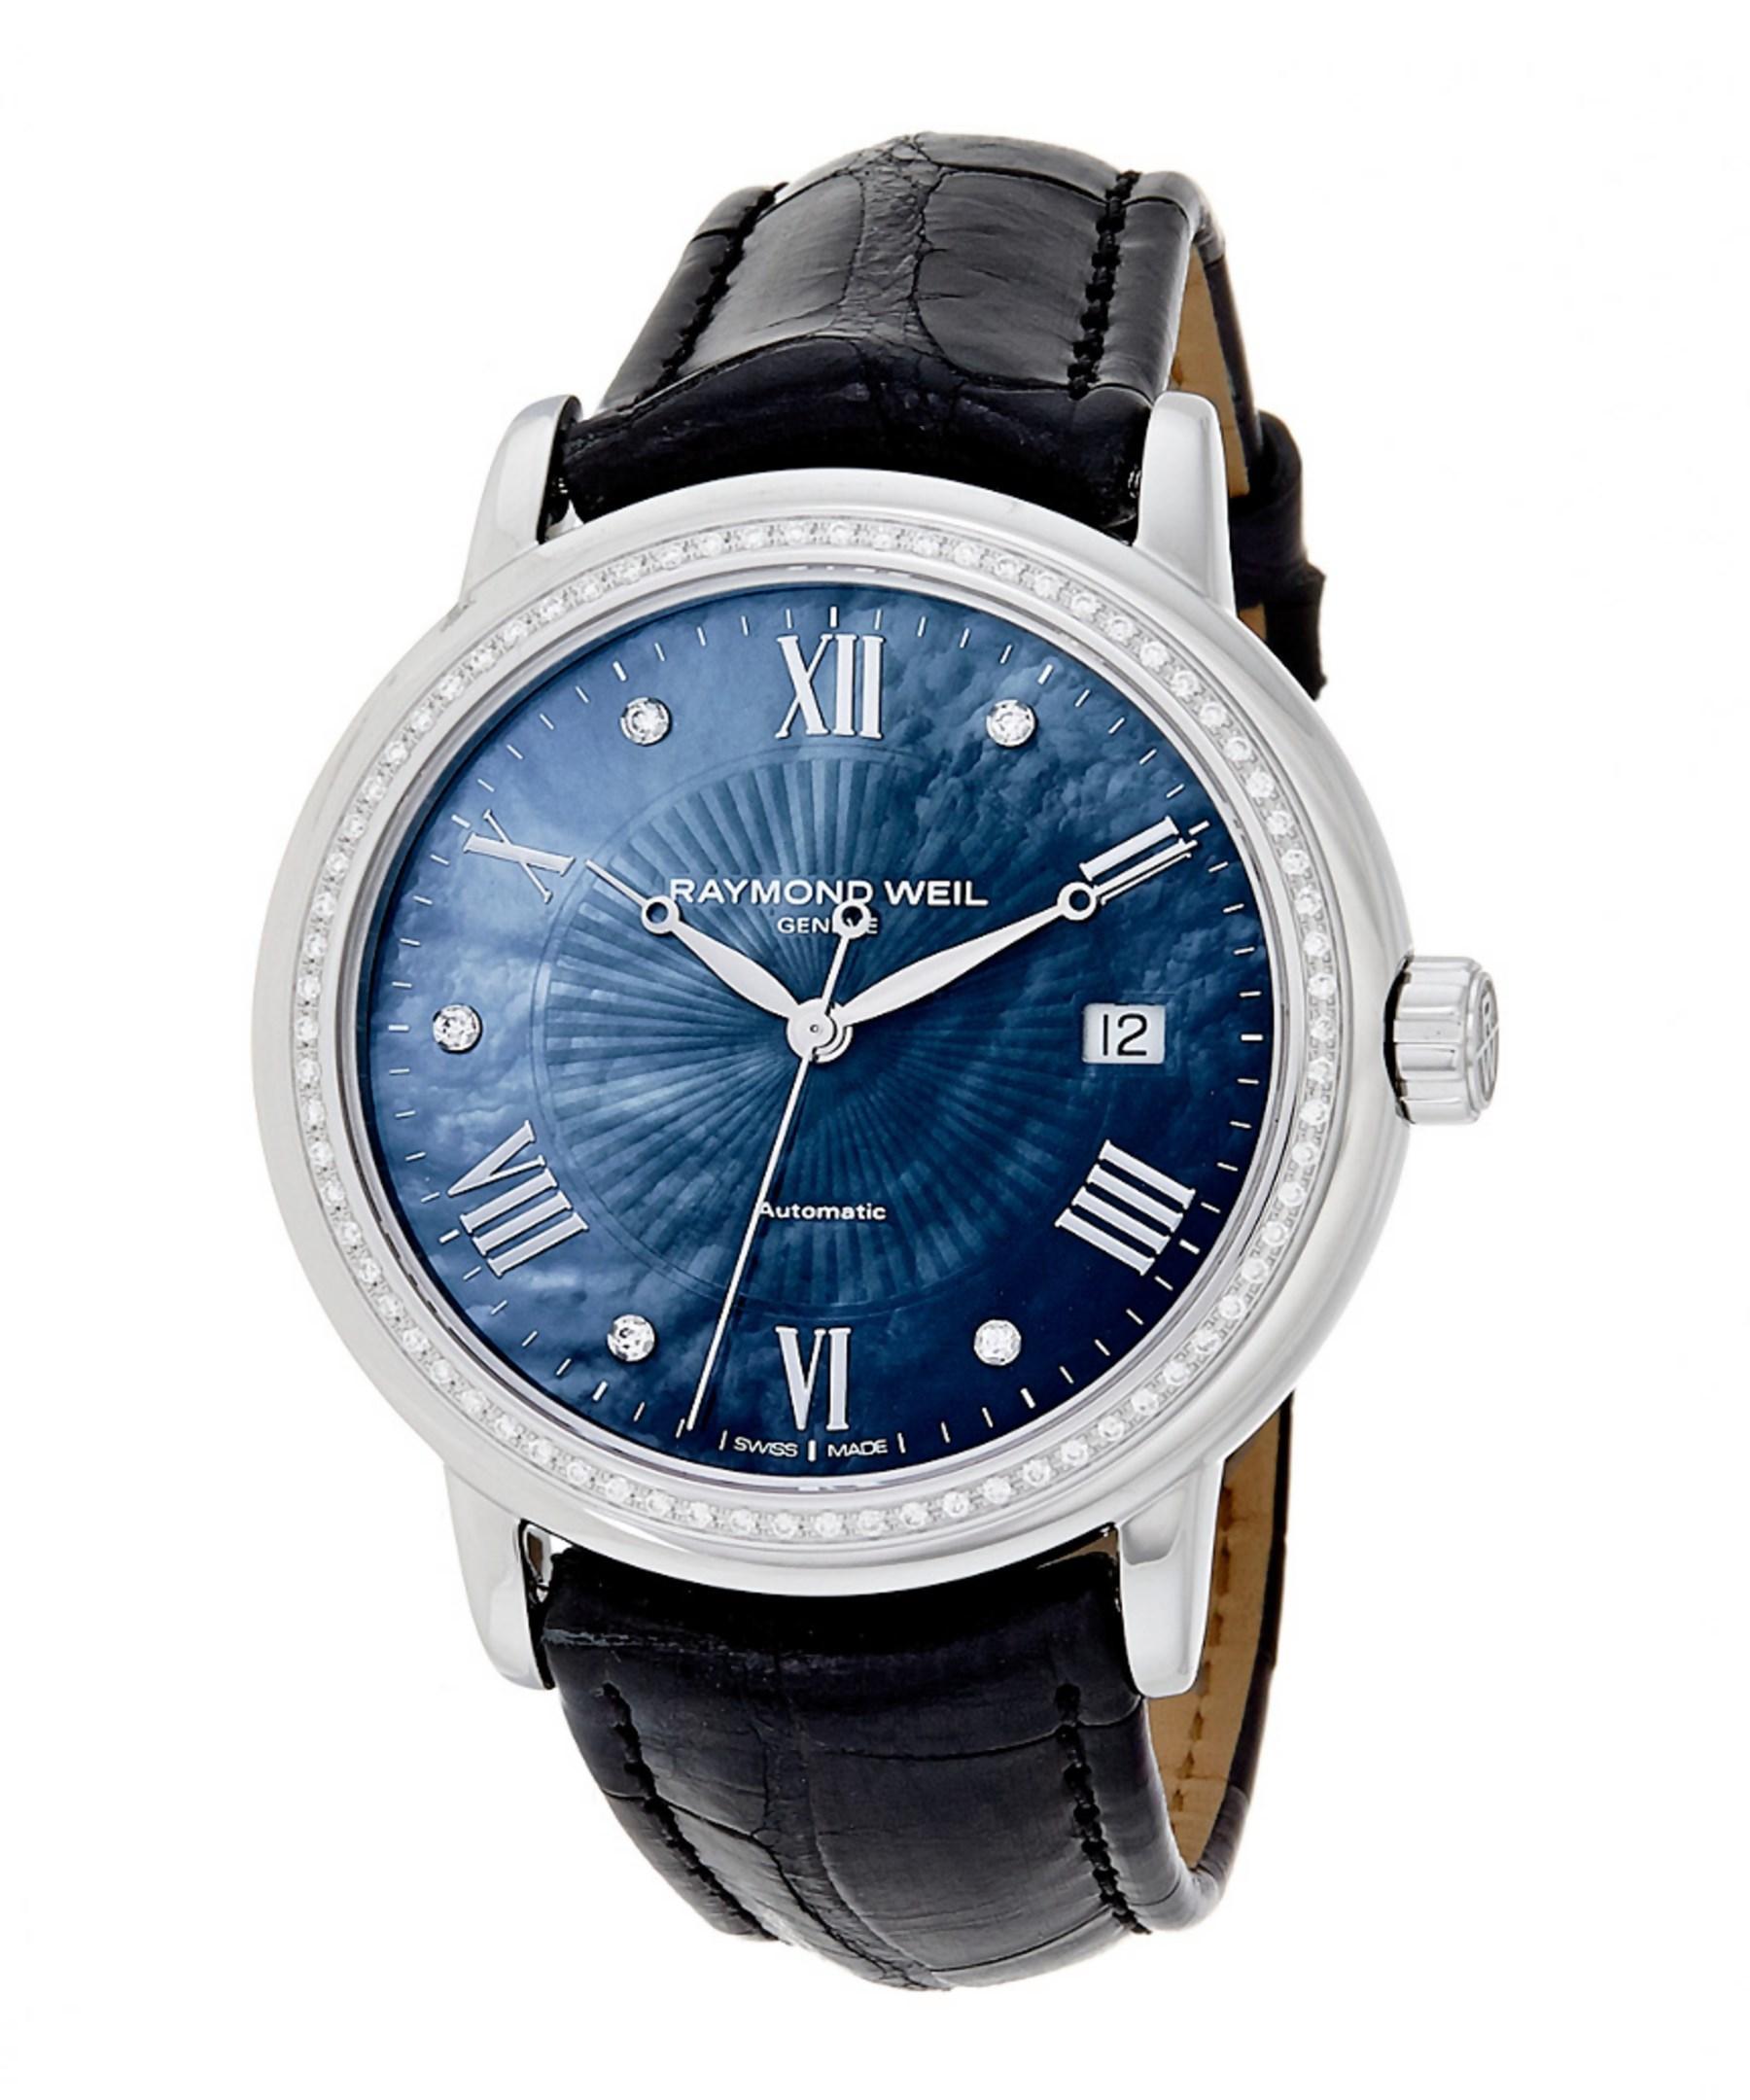 Lyst - Raymond Weil Women s Maestro Diamond Watch ad0d6e1a0d